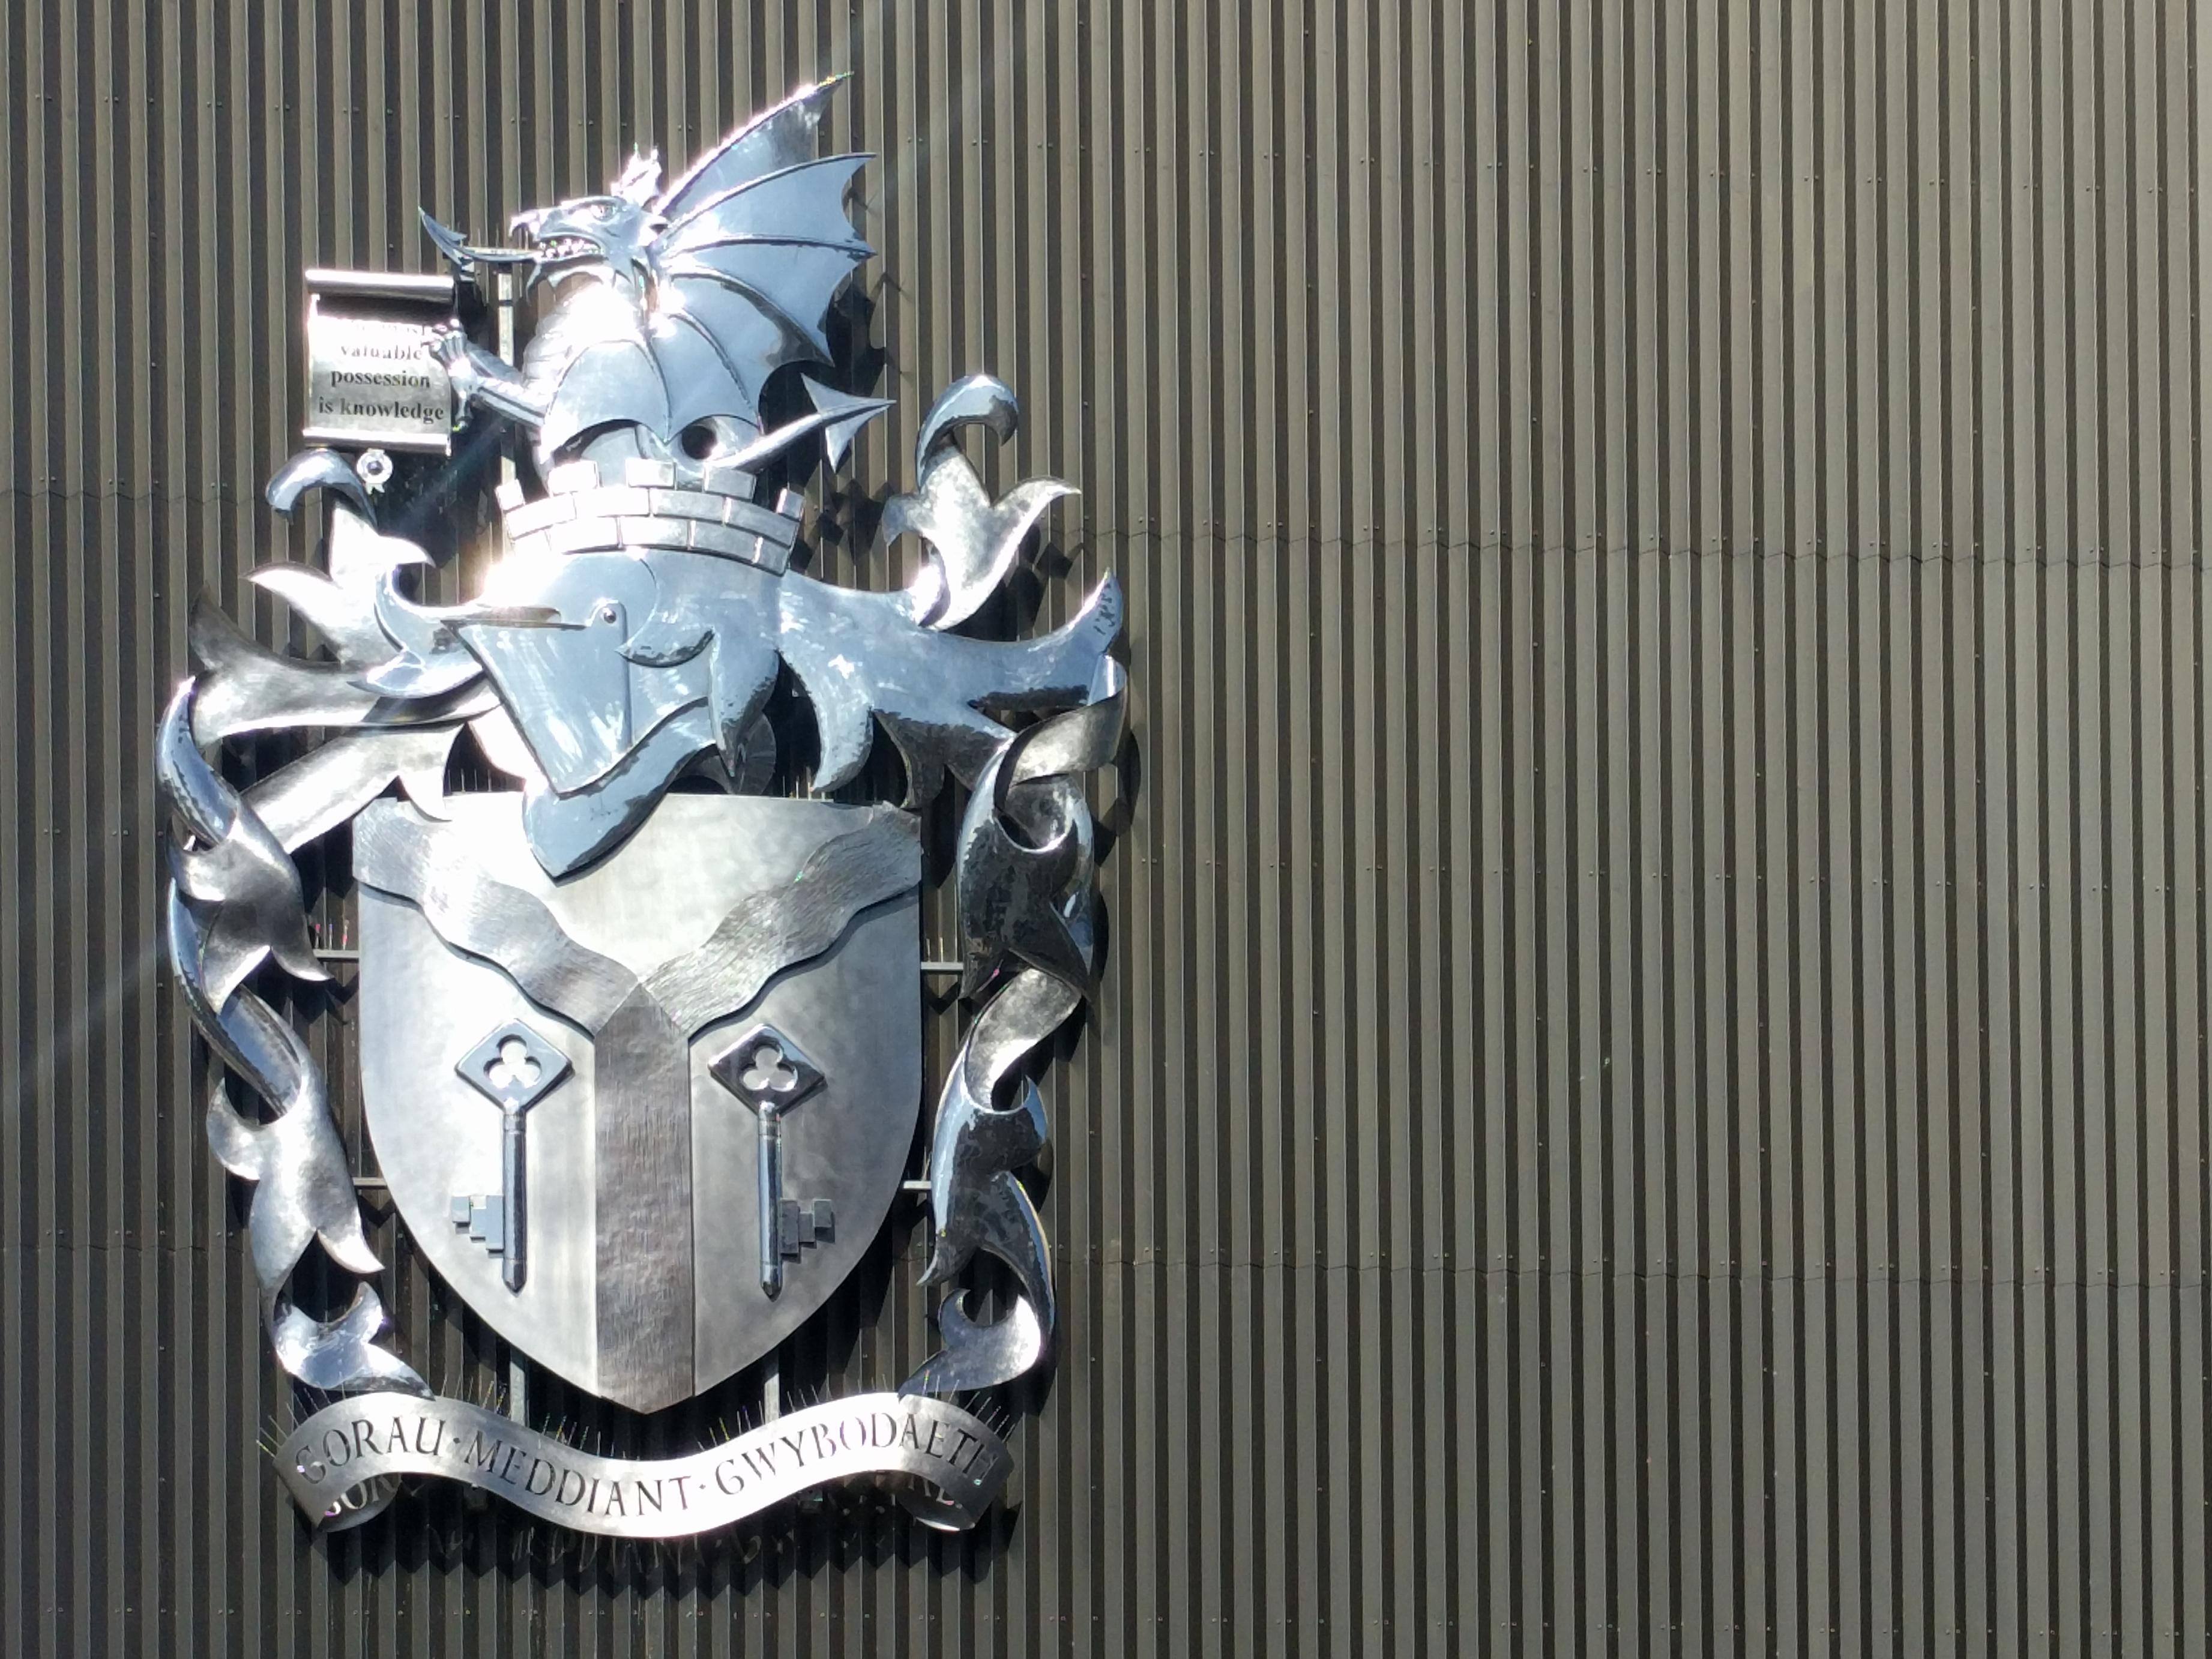 Cardiff Metropolitan University Crest